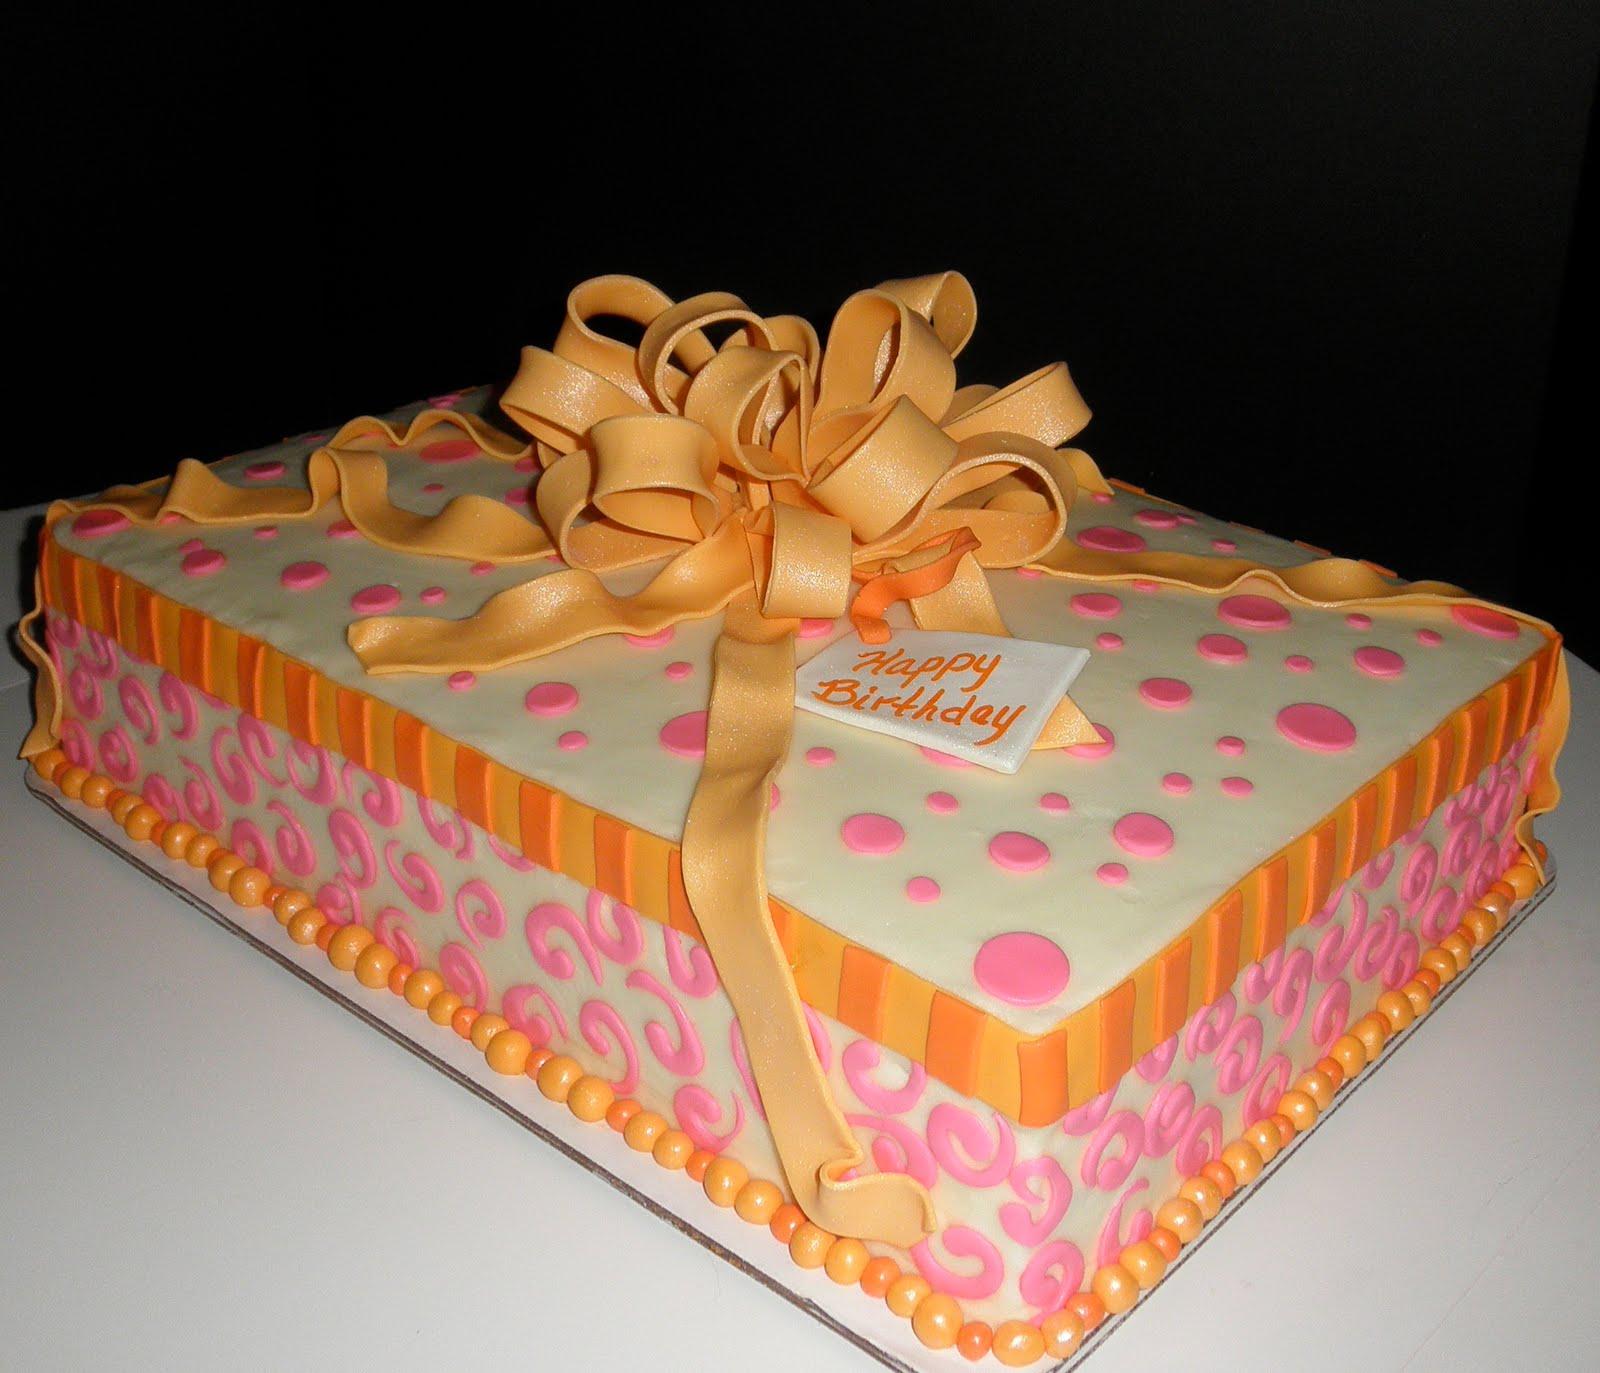 Sweet K Cake Design : Sweet T s Cake Design: Sweet T s Sheet Cake Present